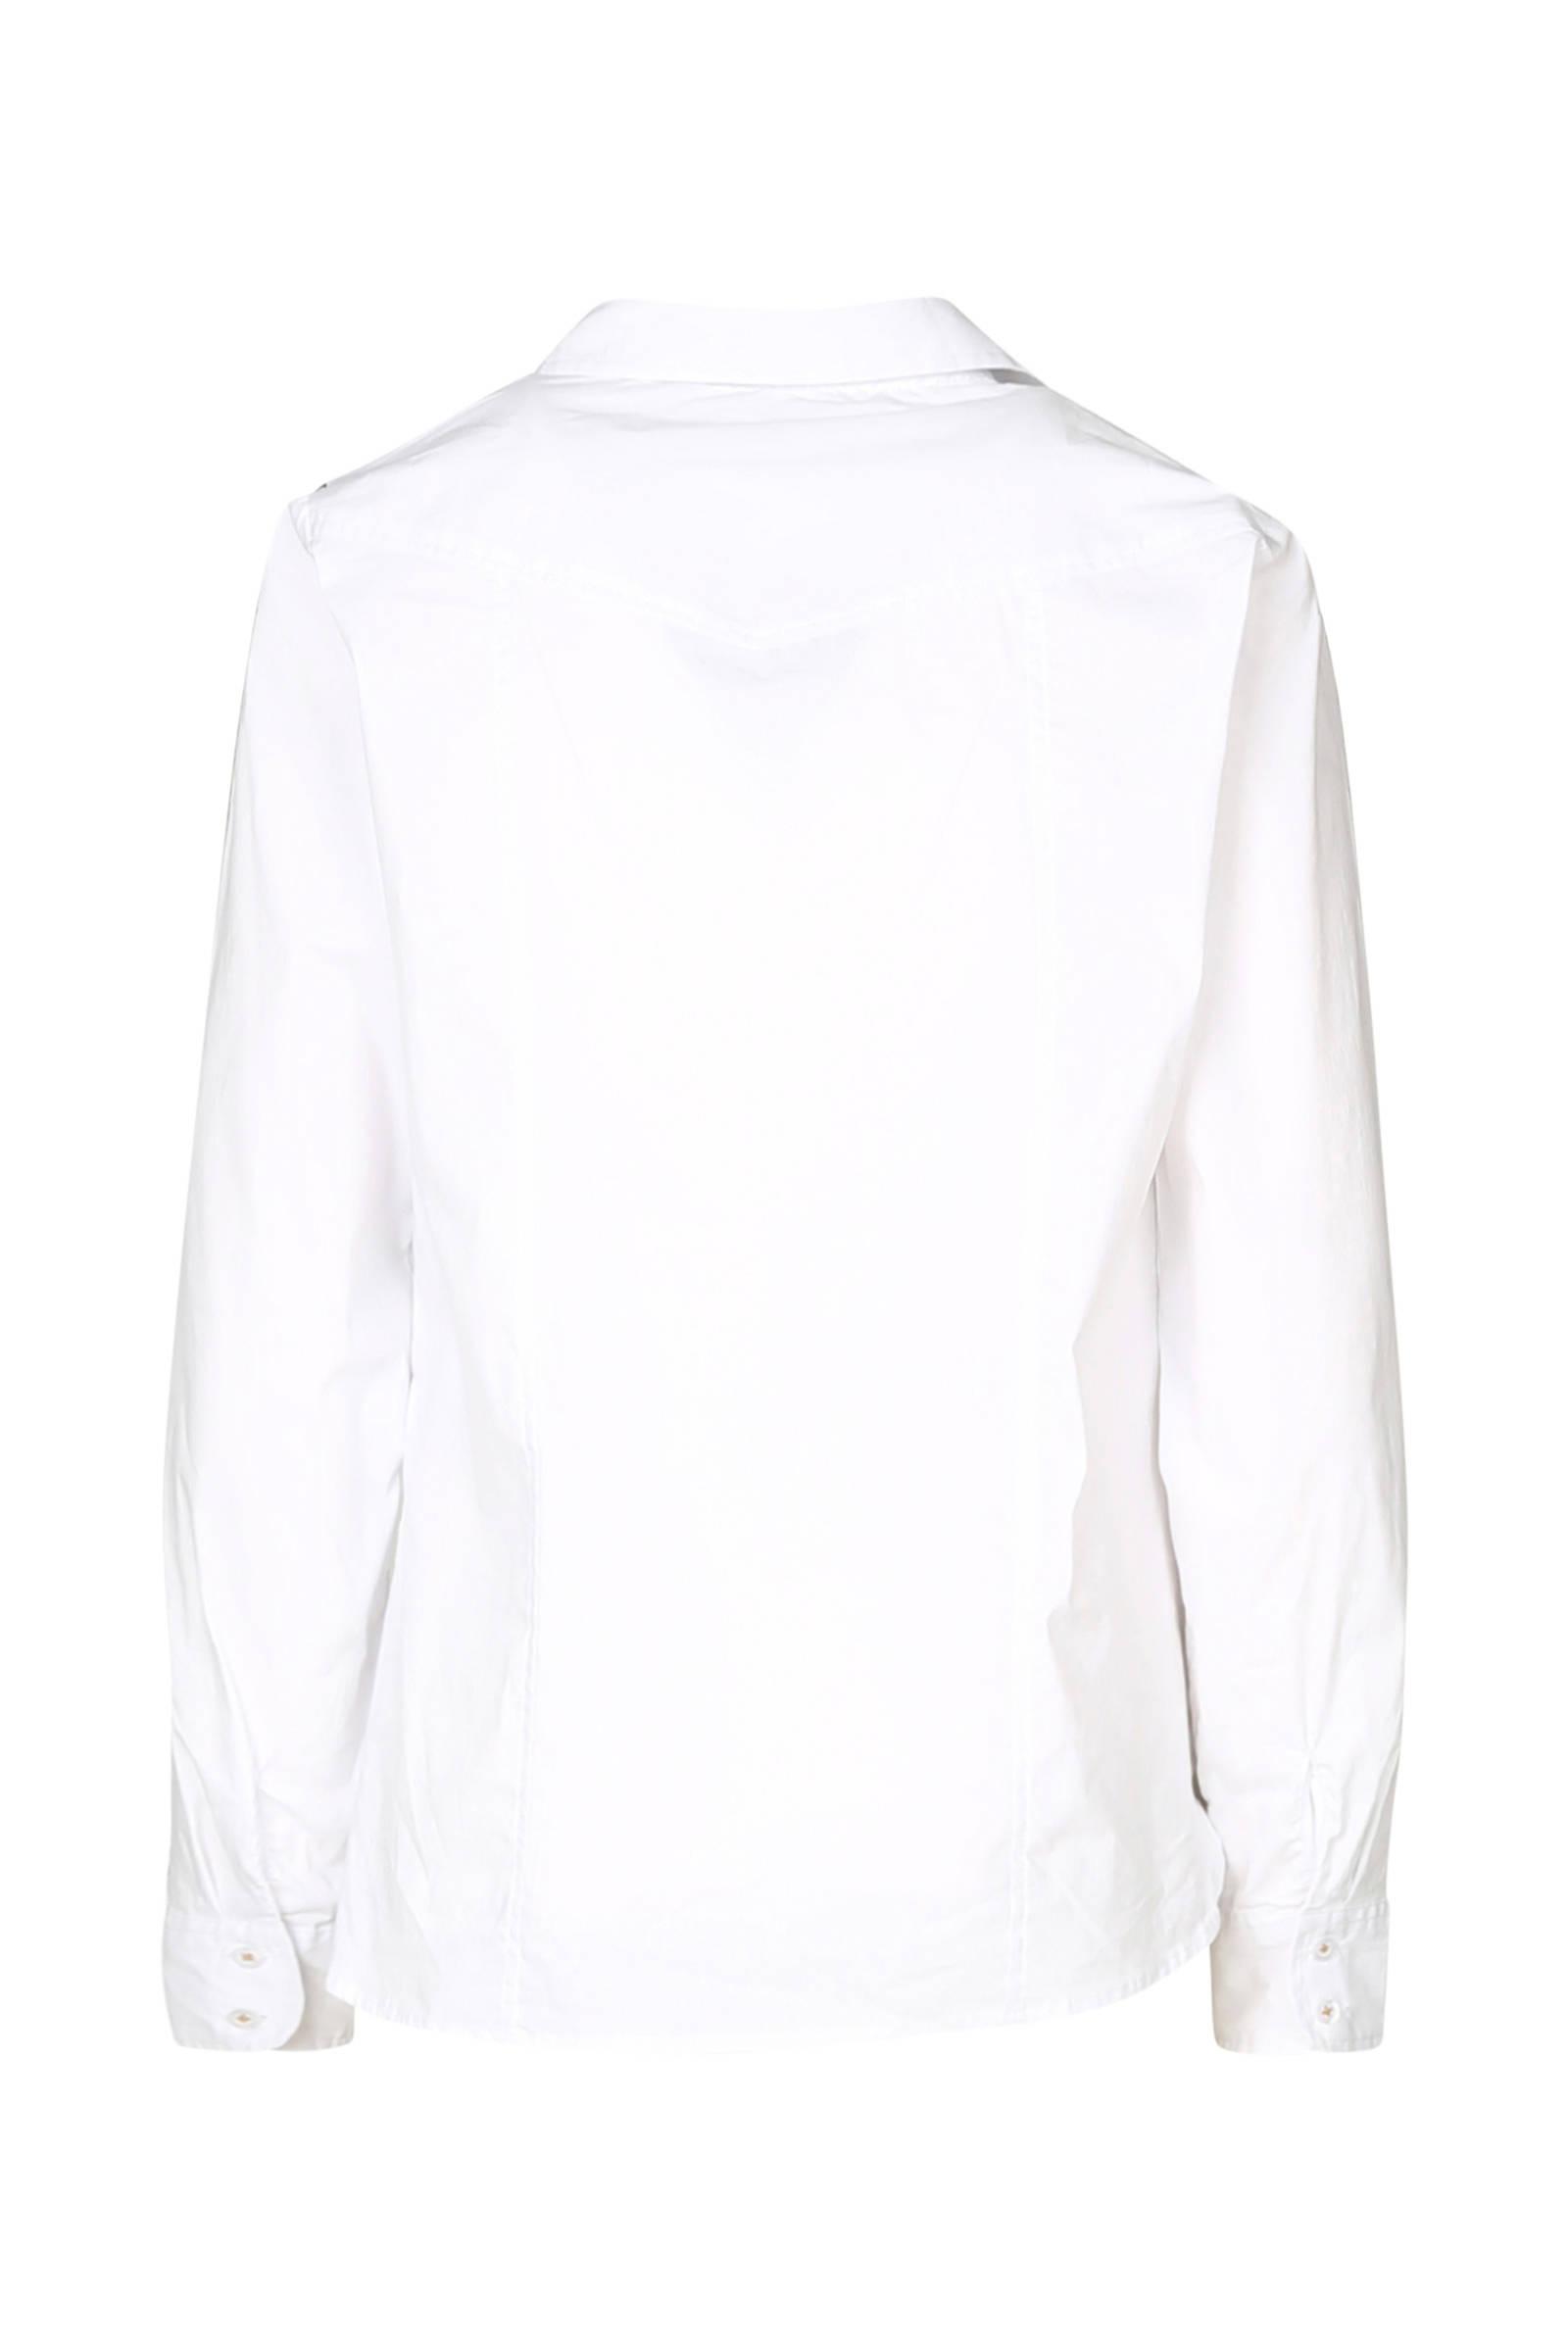 blouse Cassis blouse panterprint met Cassis details met w1vq7wgx6